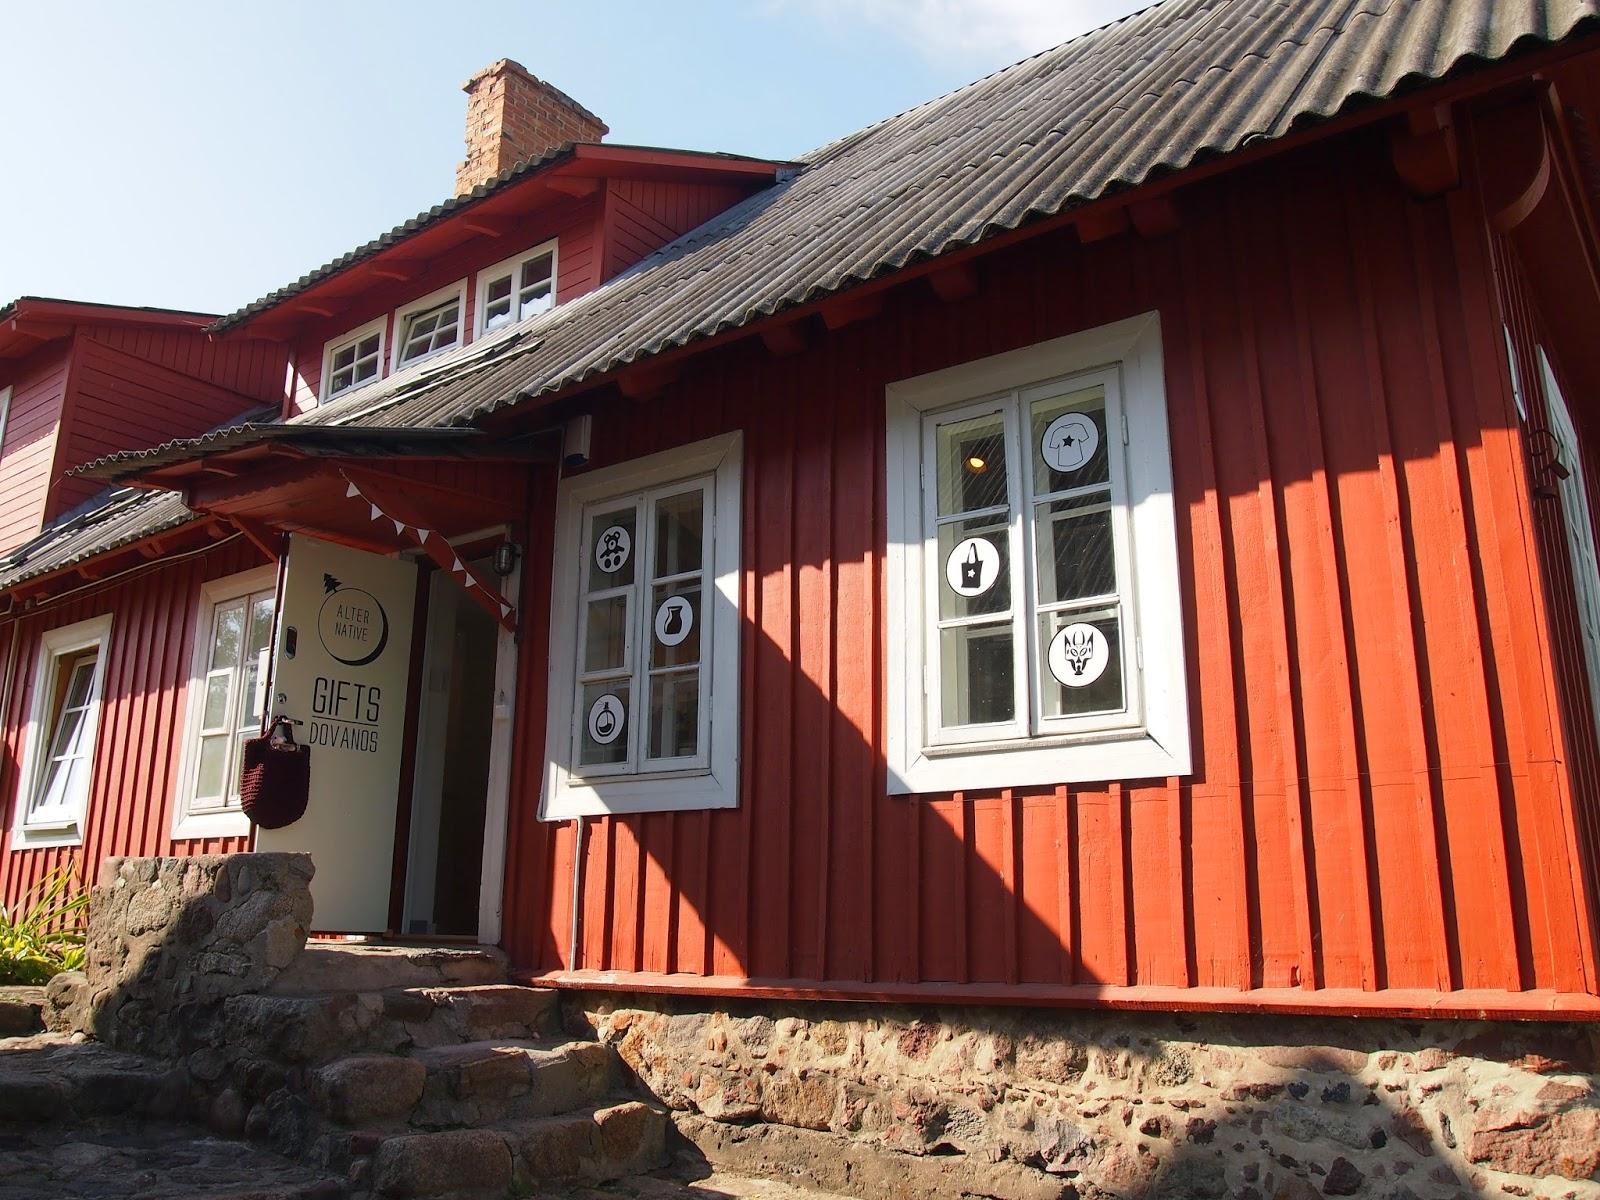 a gift shop in Trakai